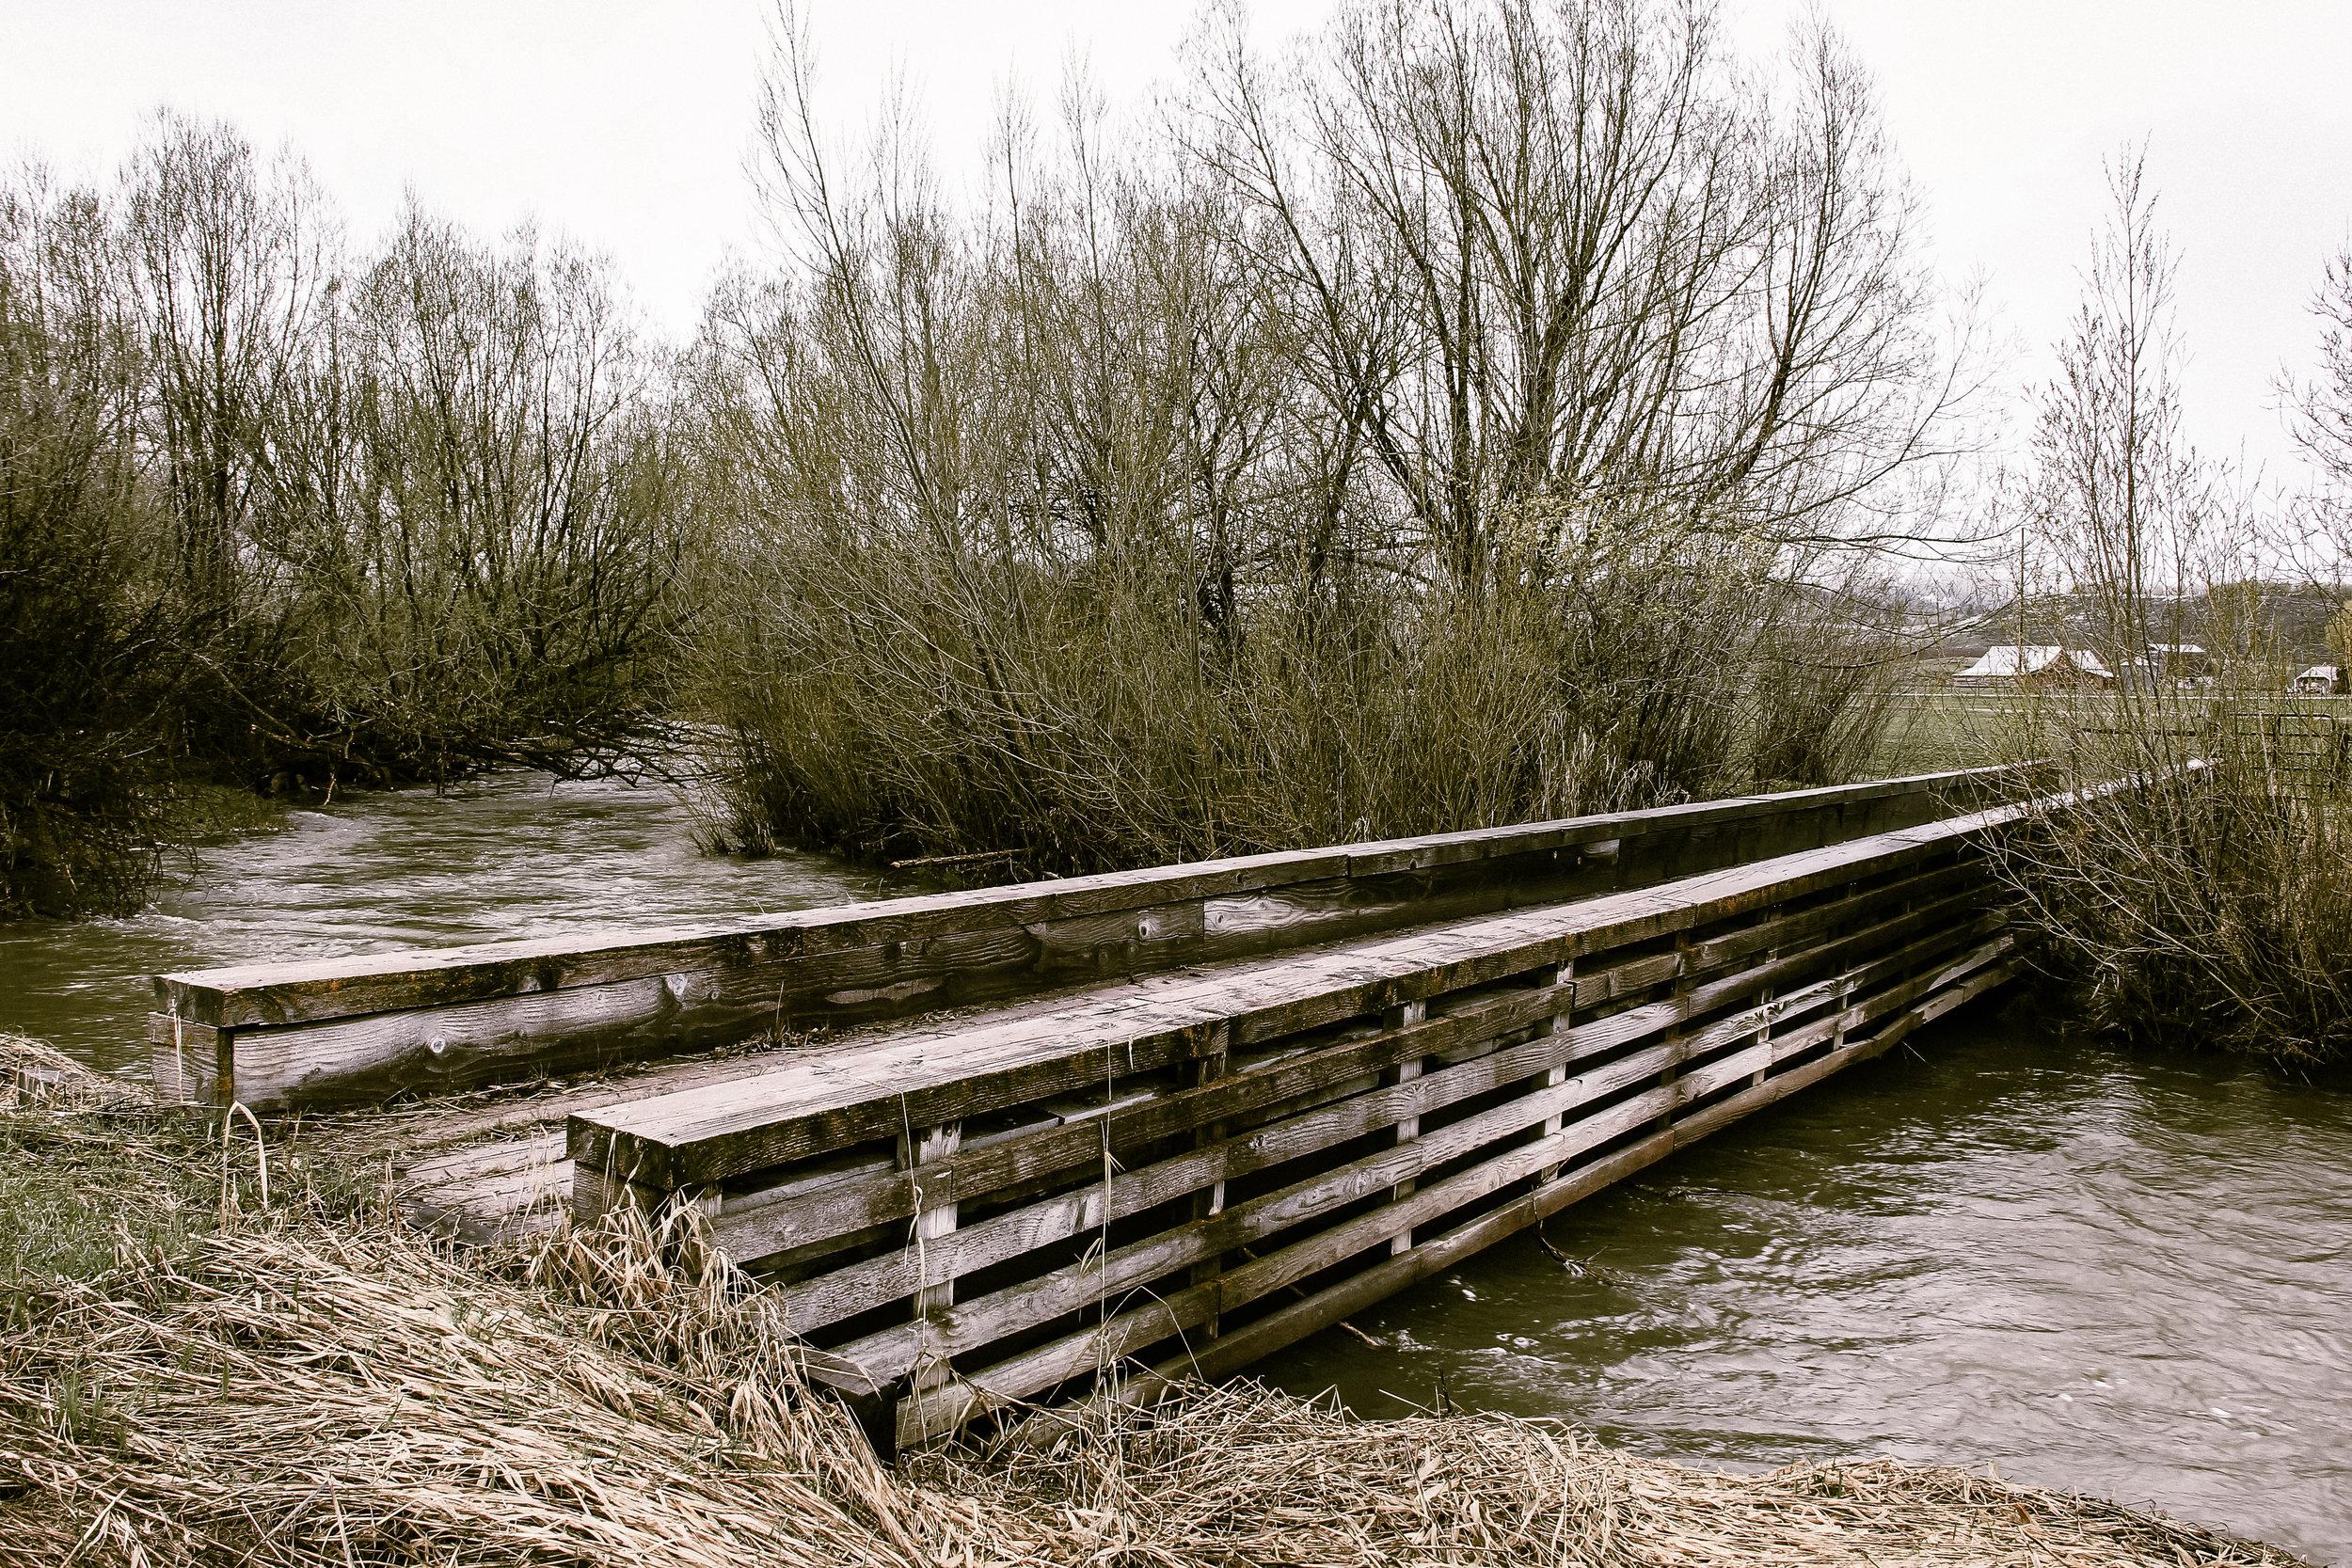 The bridge crossing Jackknife Creek